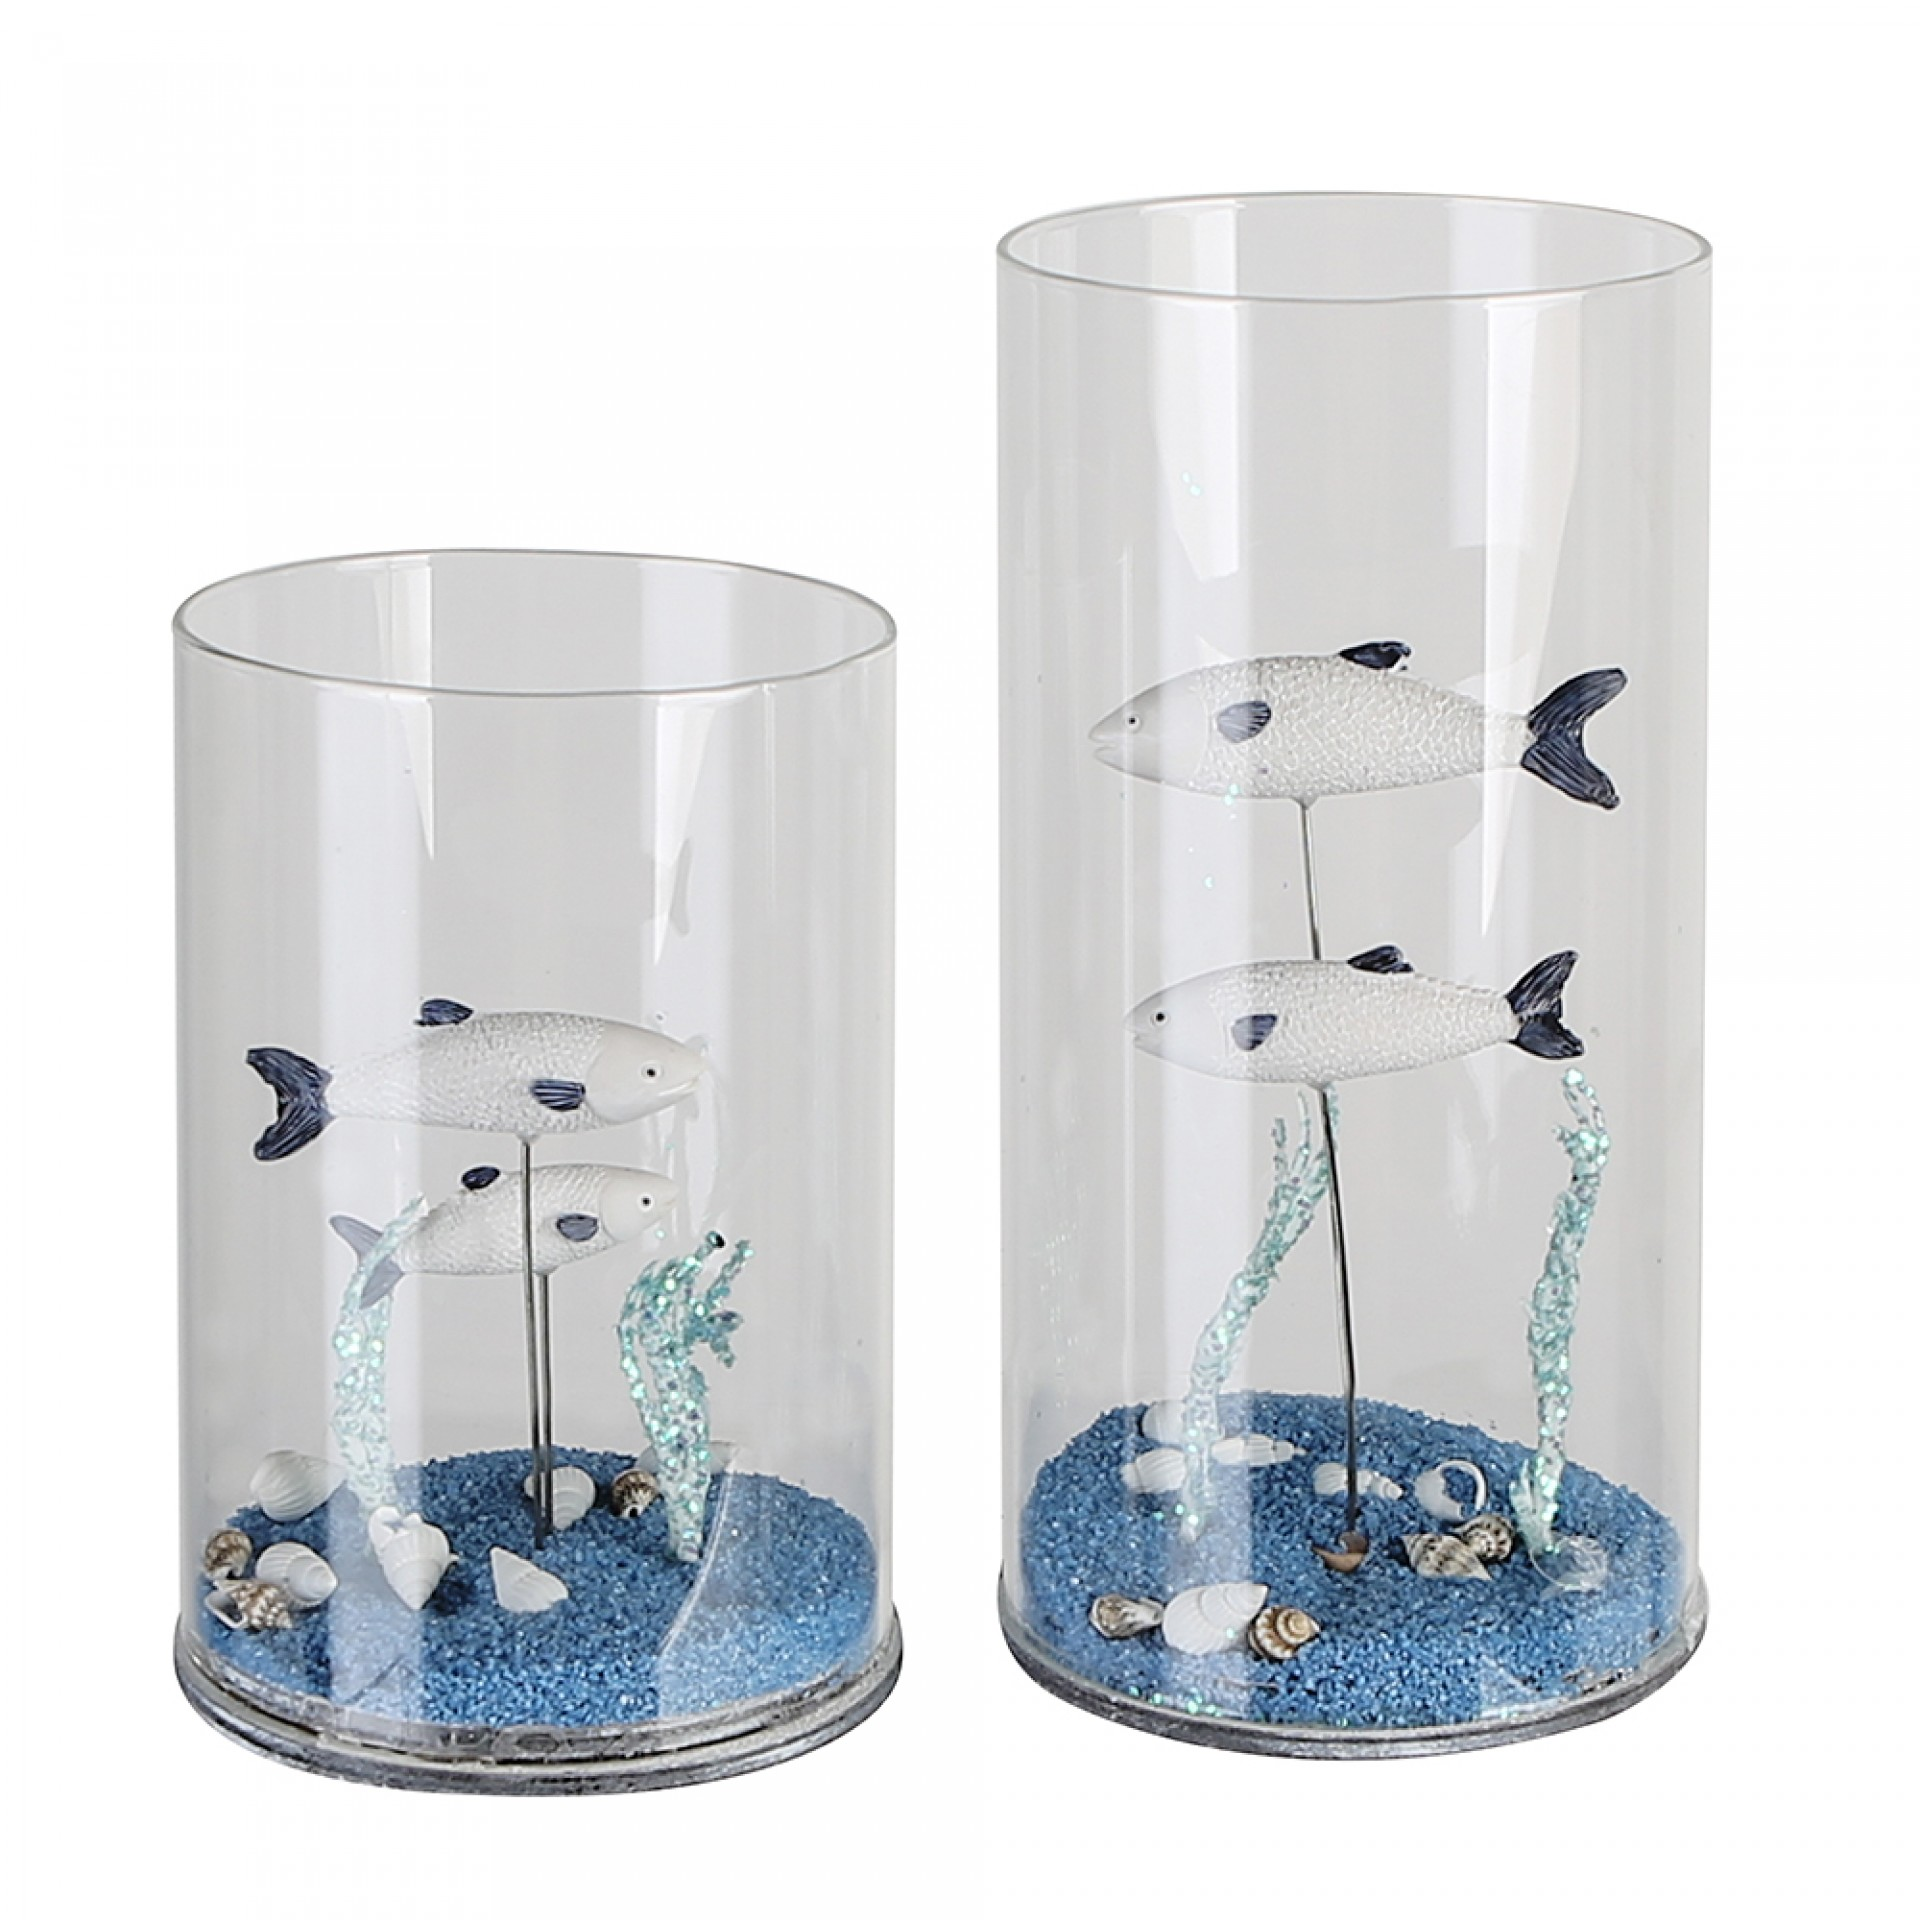 Skleněná dekorace Aquarium, 15 cm, vícebarevná